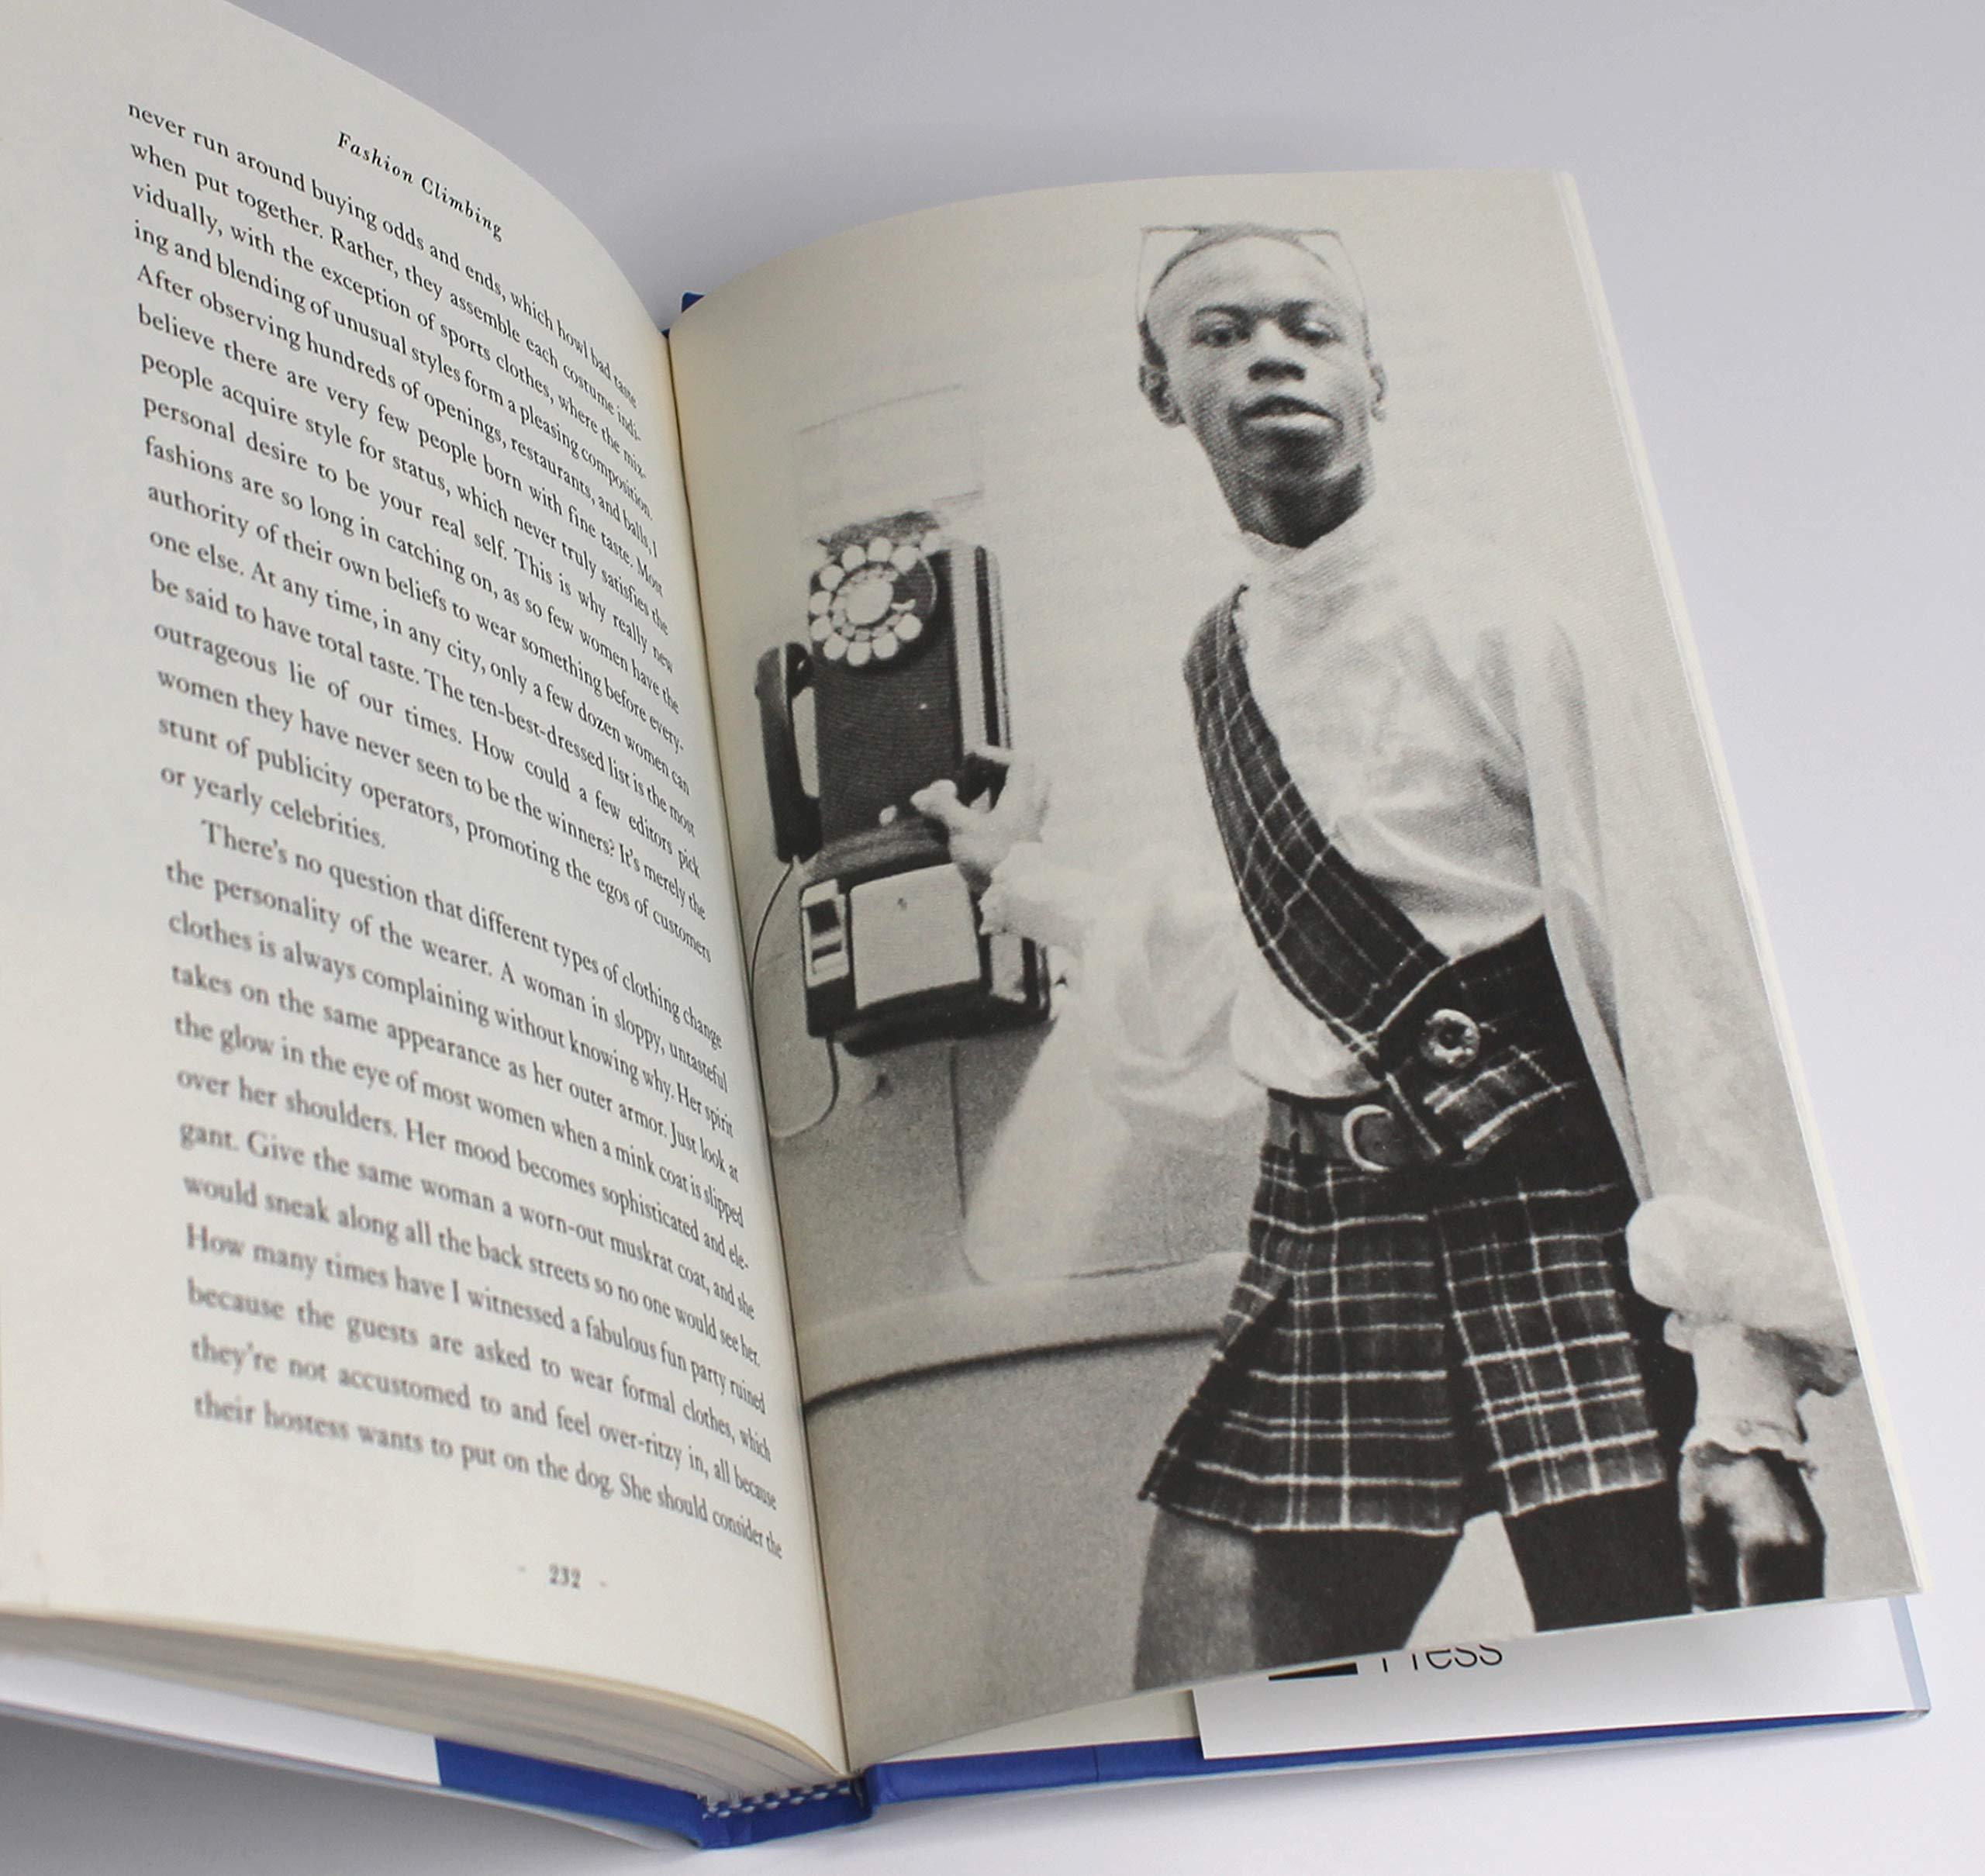 d9a98c54430 Amazon.com  Fashion Climbing  A Memoir with Photographs (9780525558705)   Bill Cunningham